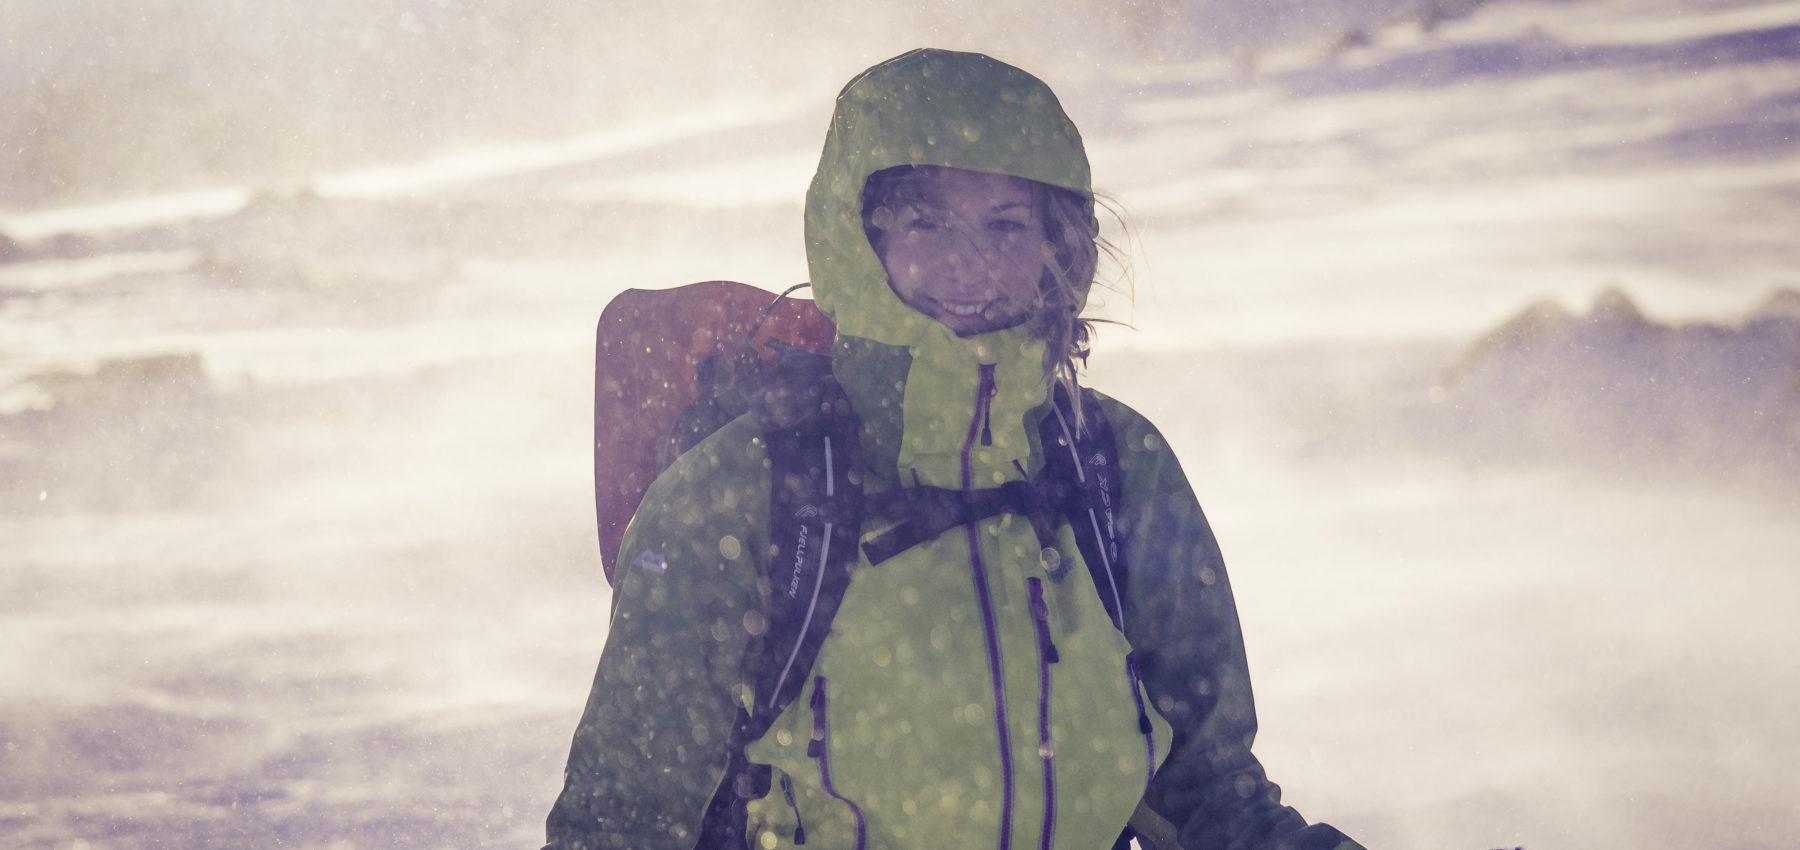 Tar du vinterens fineste bilde? Vinn telt fra Fjällräven